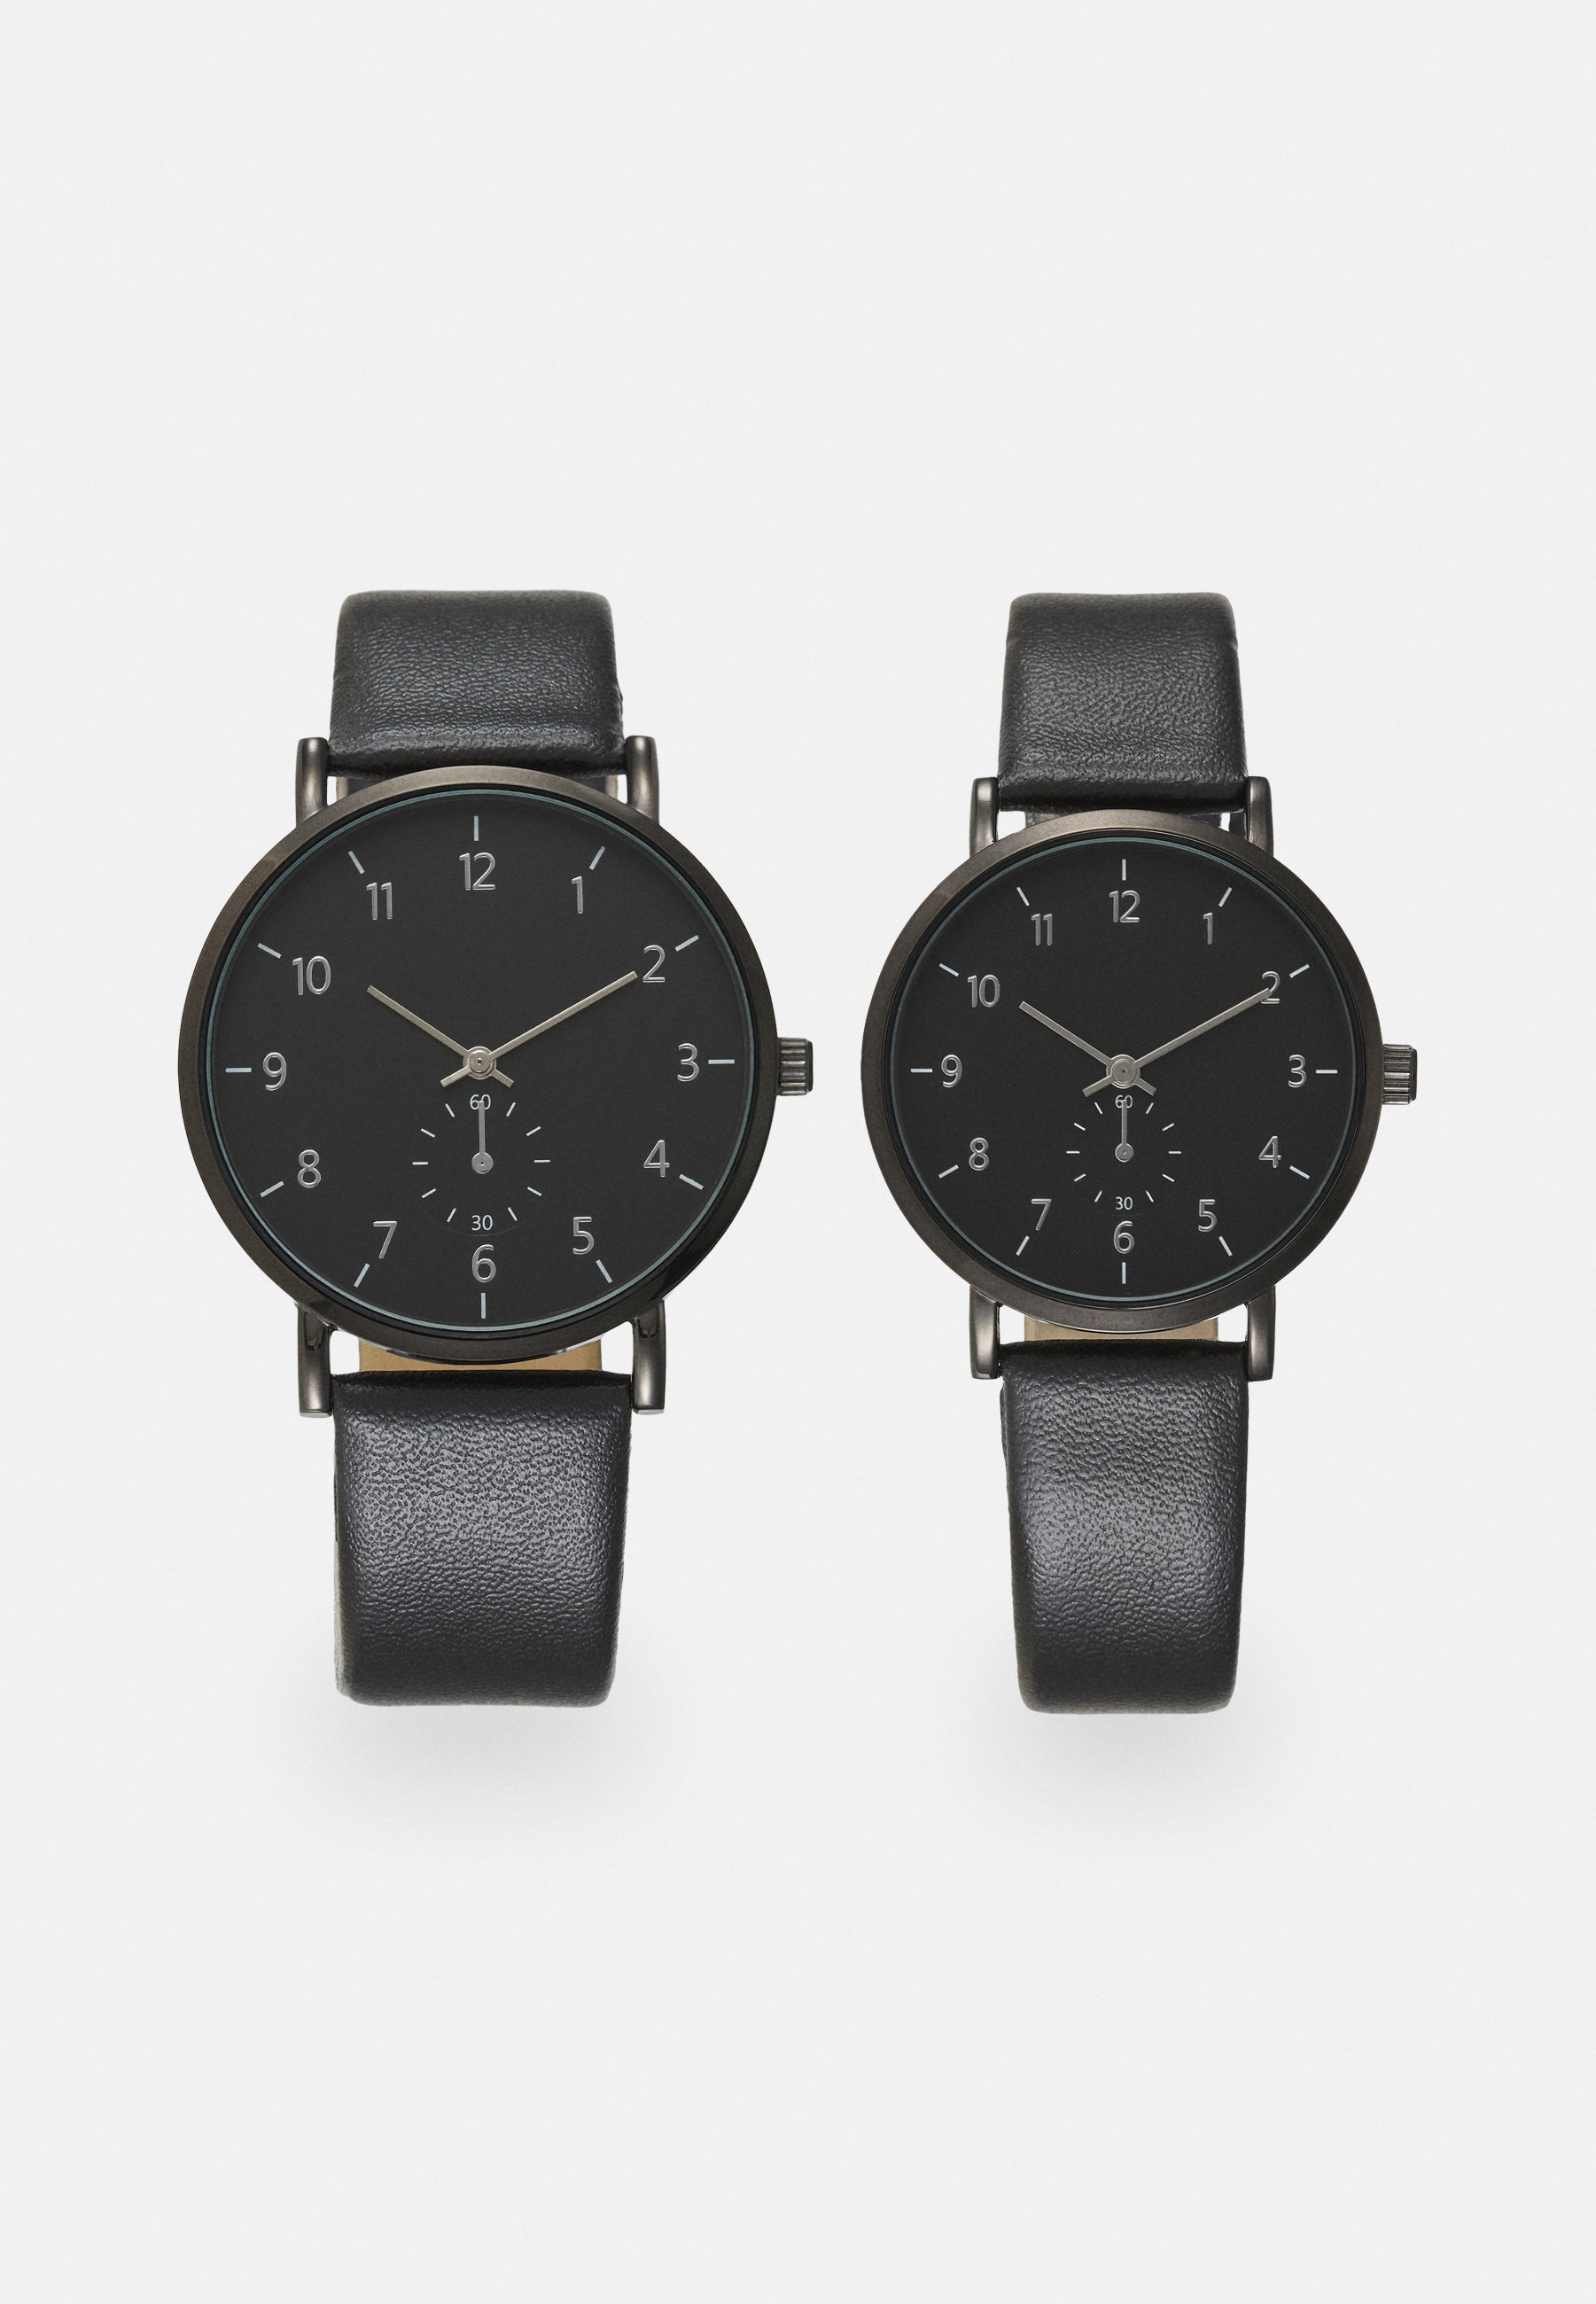 Men COUPLE WATCHES GIFT SET - Watch